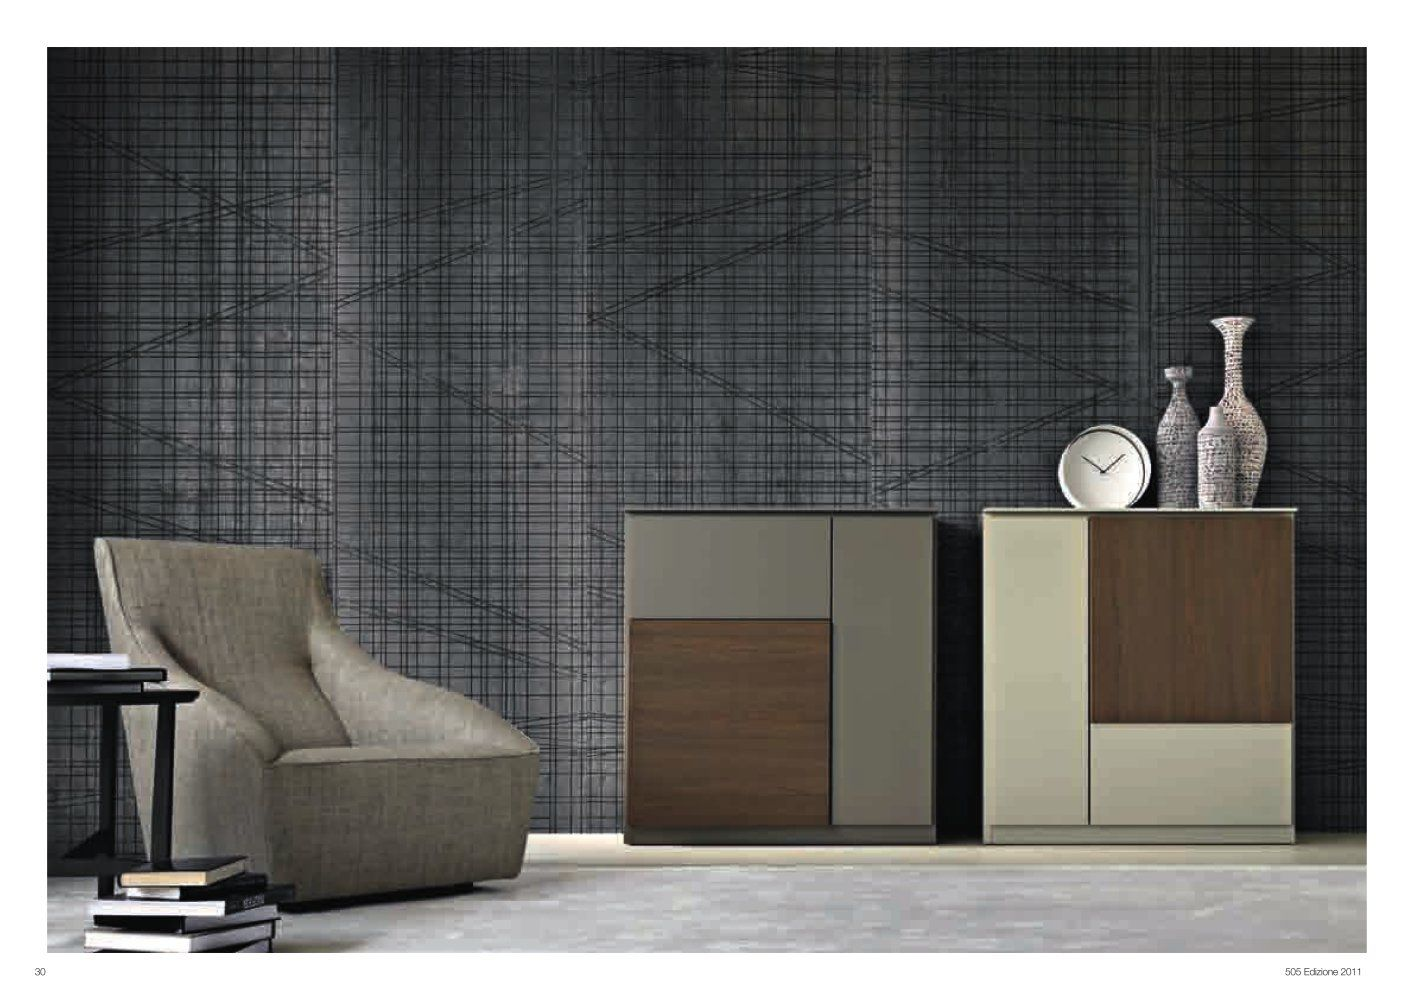 Mobili tavoli sedie 4 7 single units tables chairs cot for Sedie design furniture e commerce